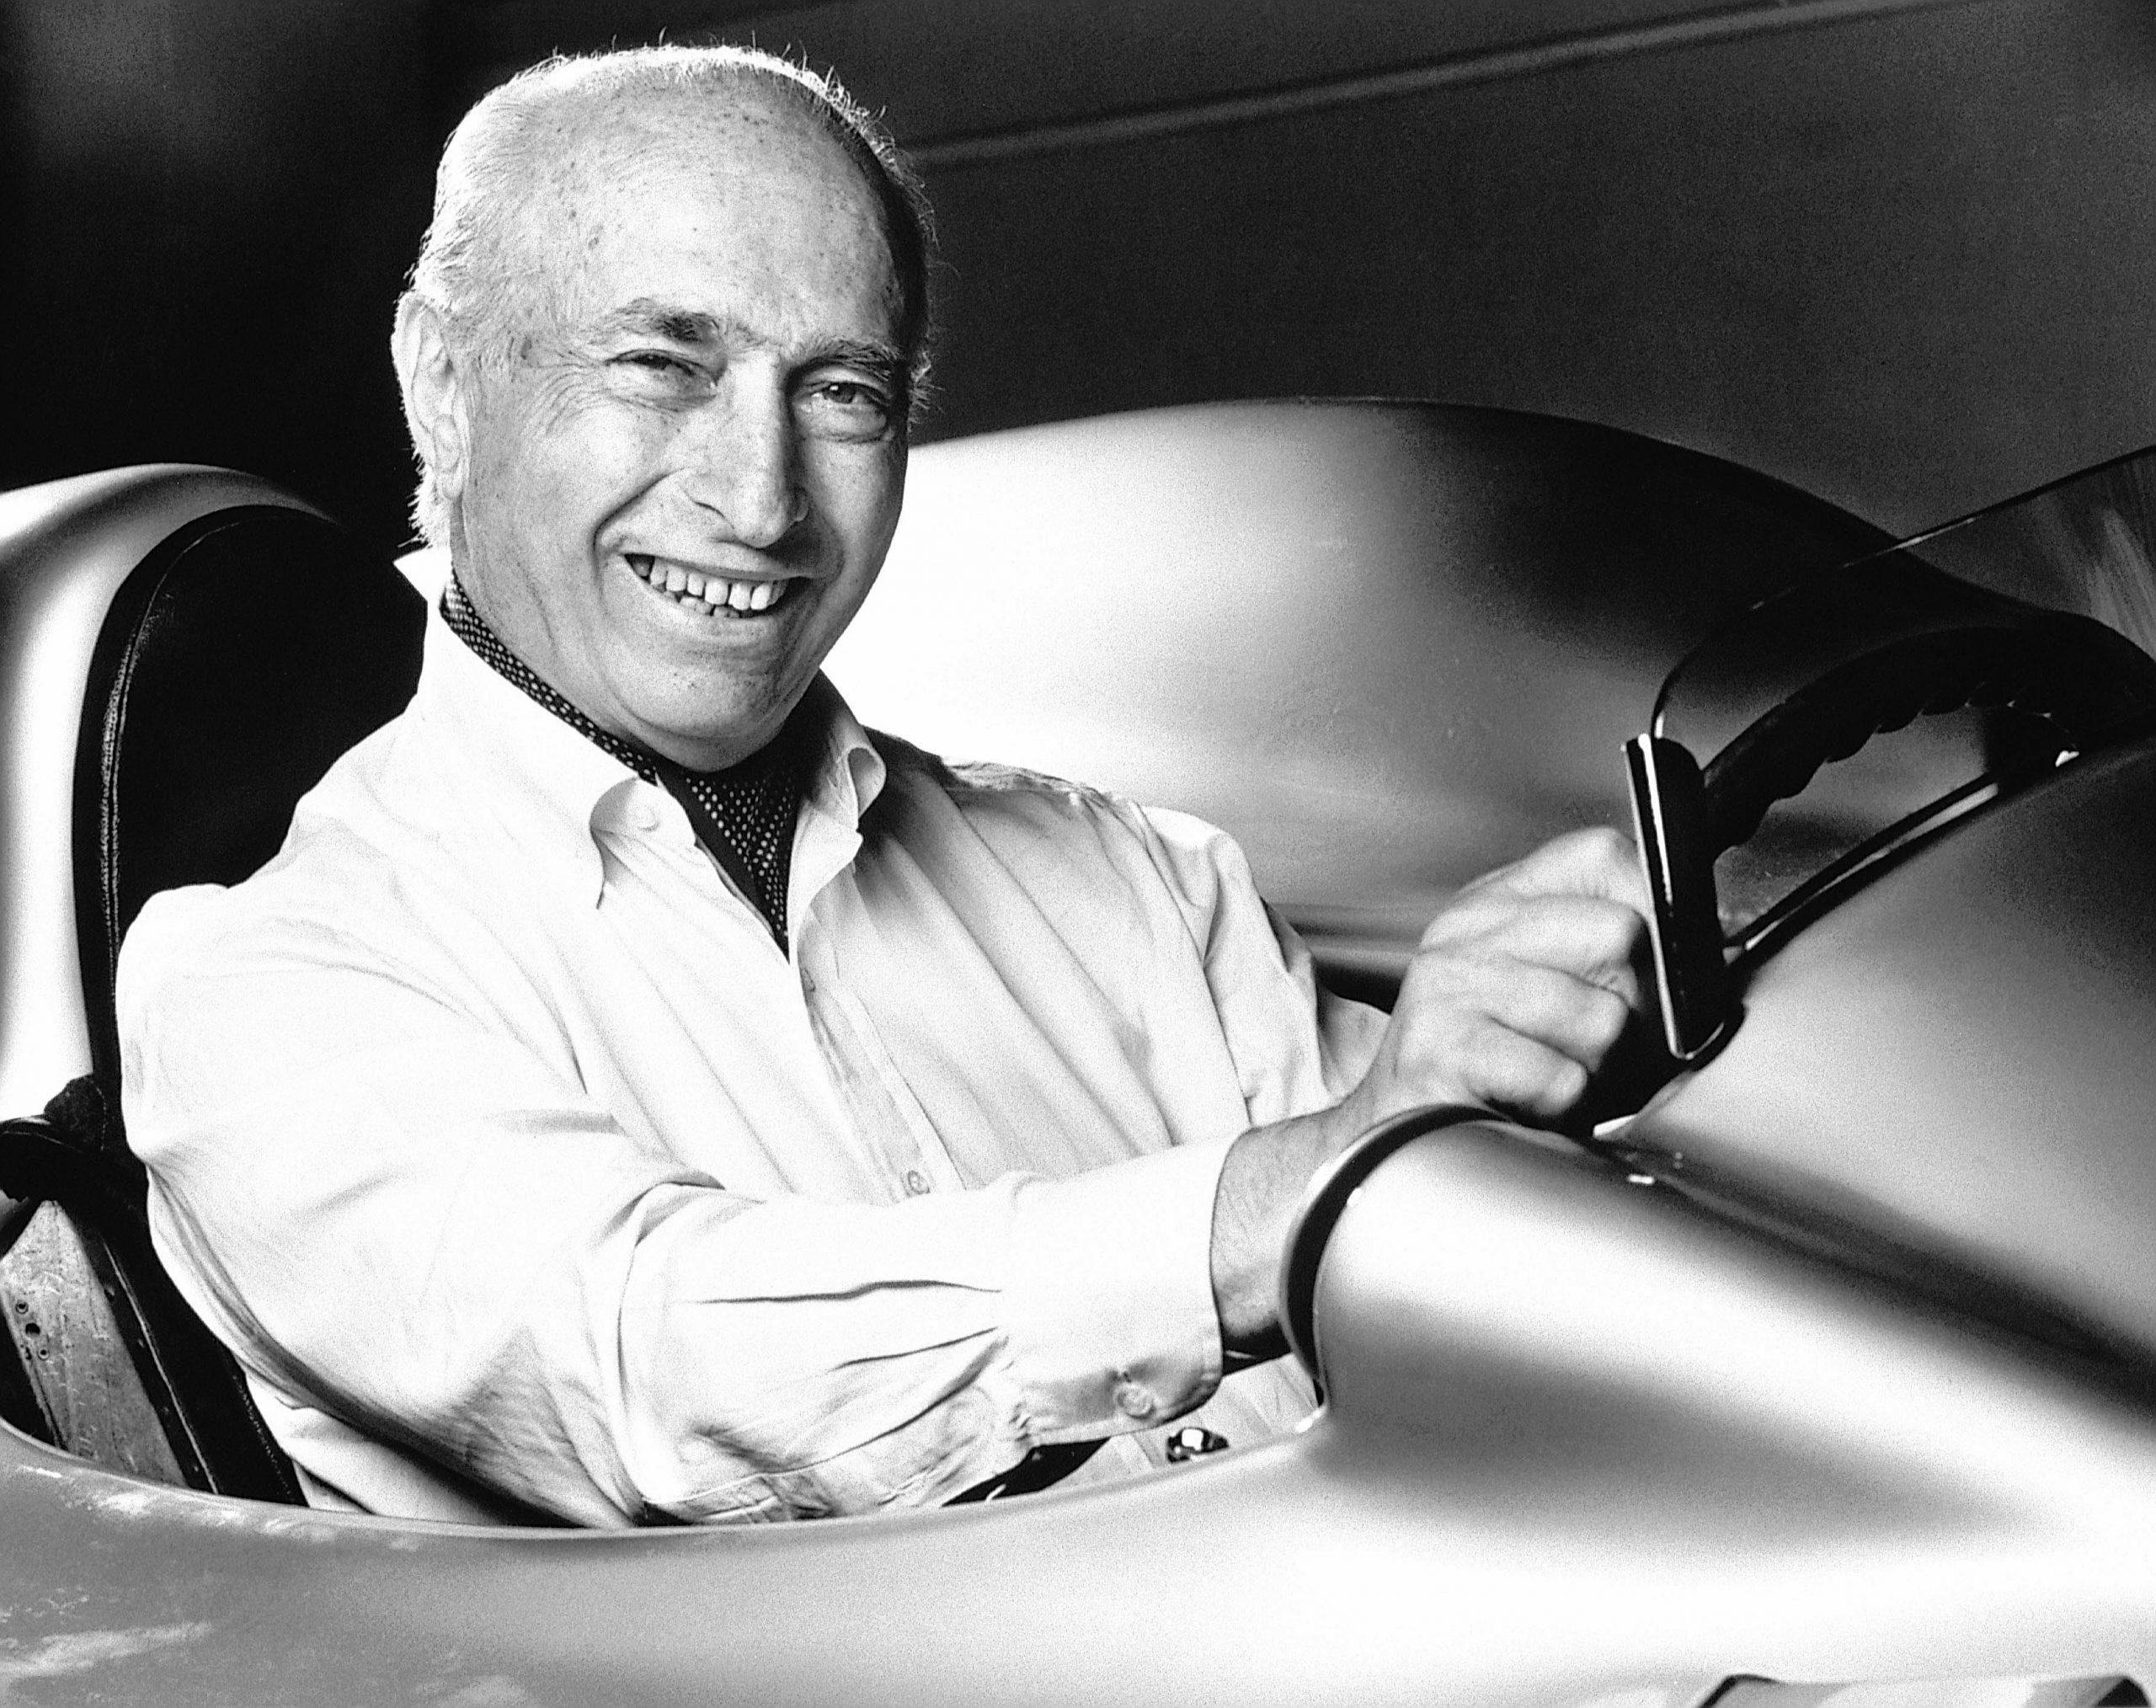 Juan Manuel Fangio achter stuur